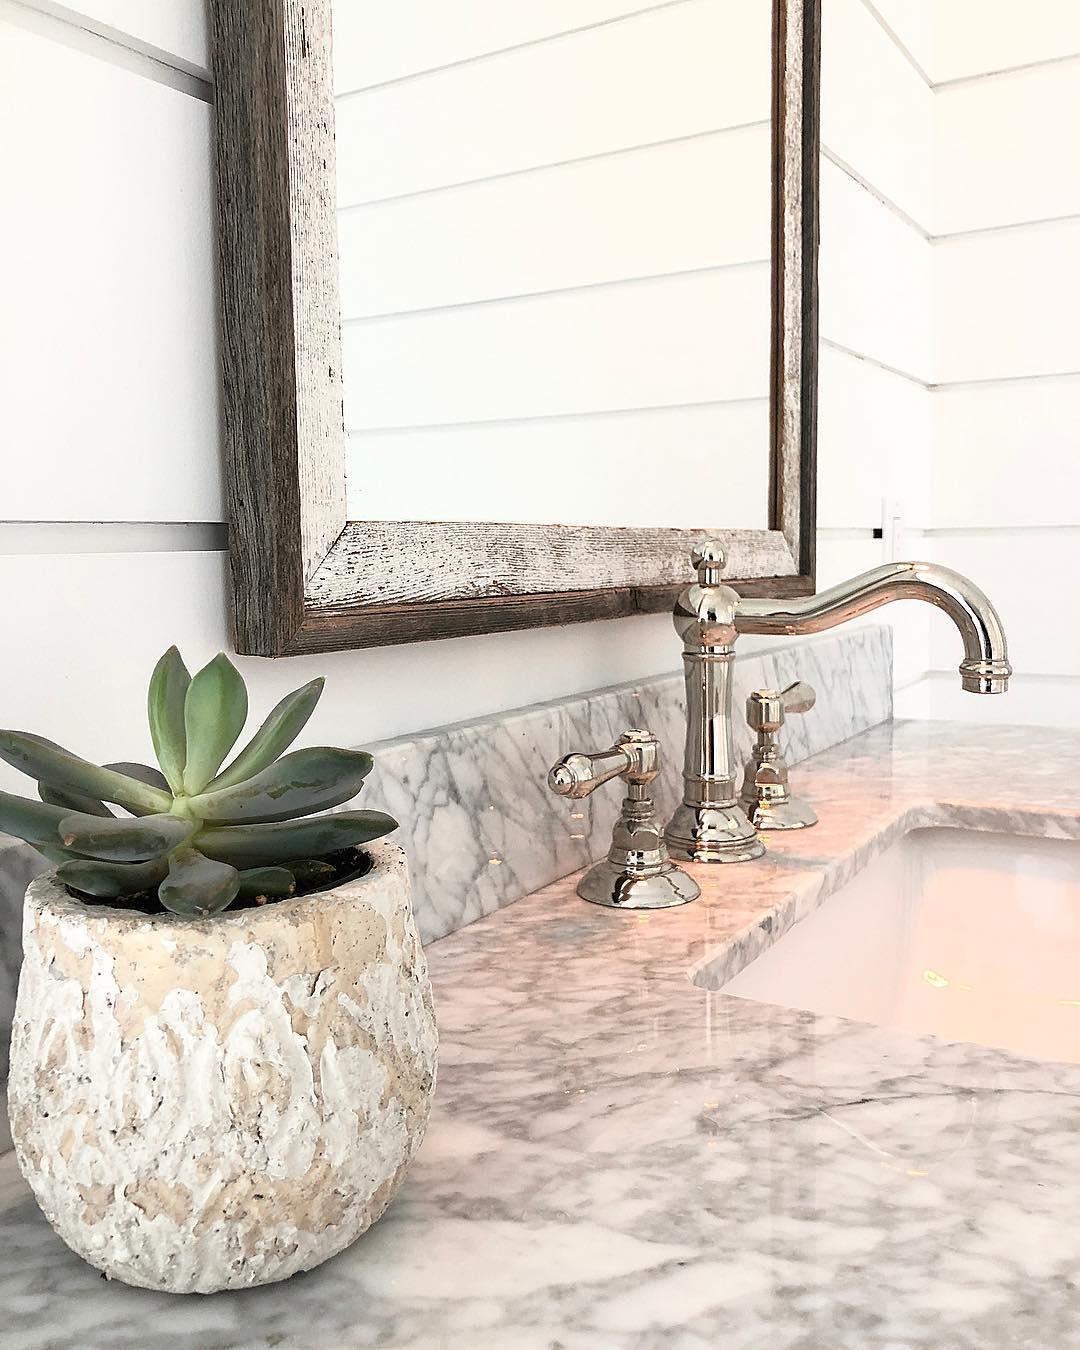 Custom Mirror Example in a Bathroom